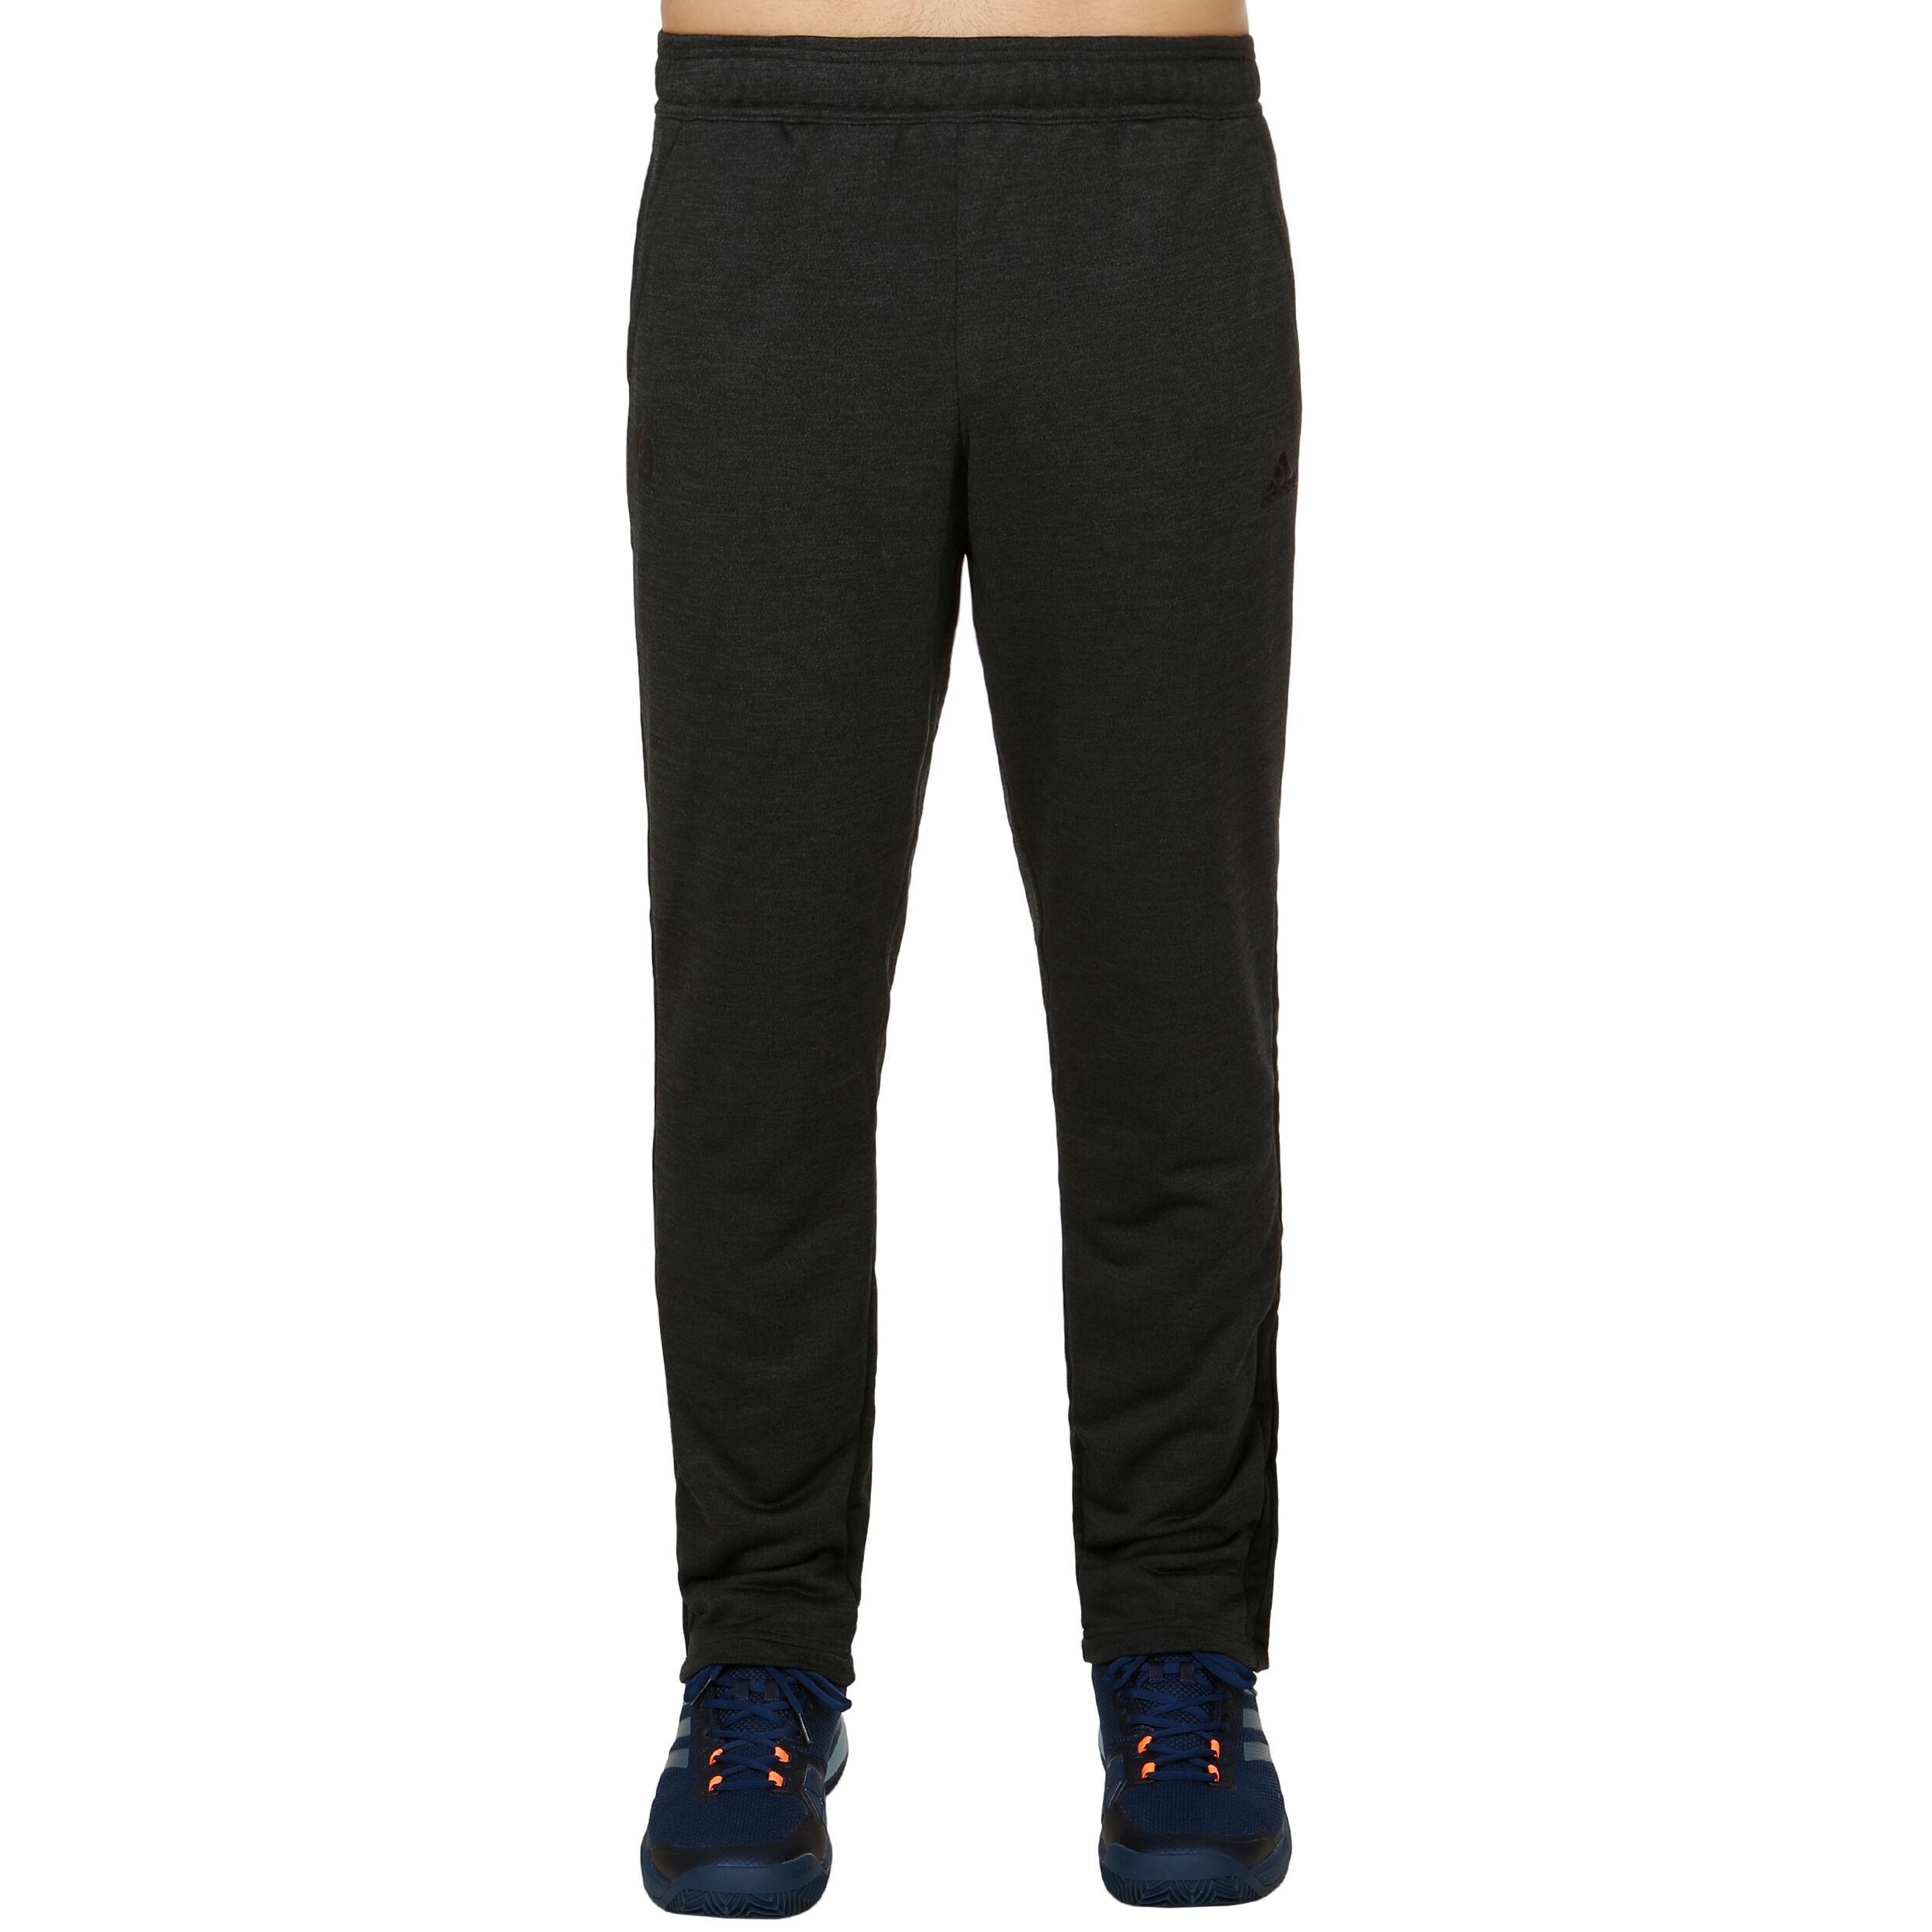 pantalon survêtement hommes adidas